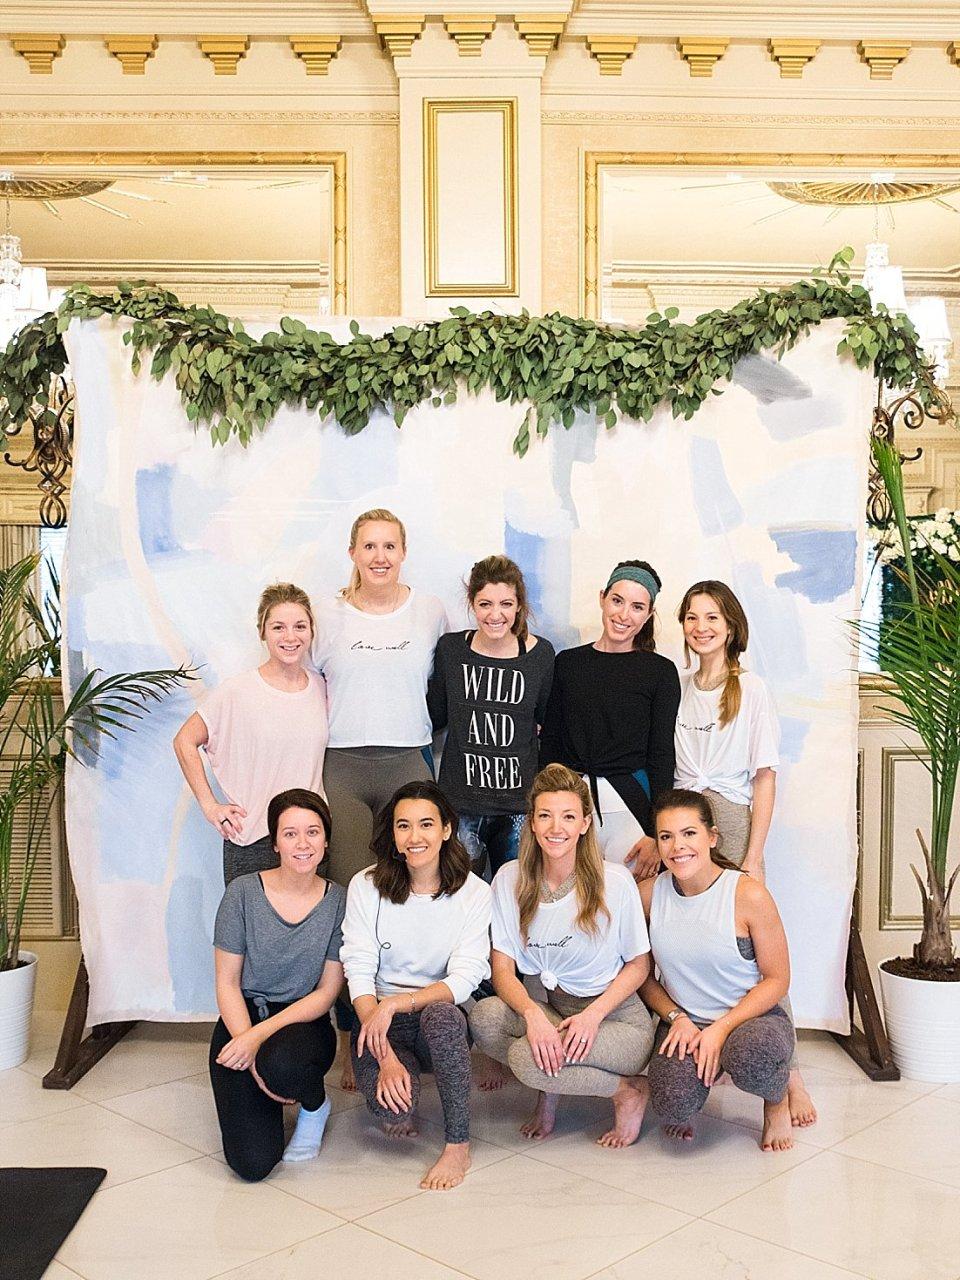 The Joyful Influencer retreat at the kentucky castle Instagram influencer event yoga class